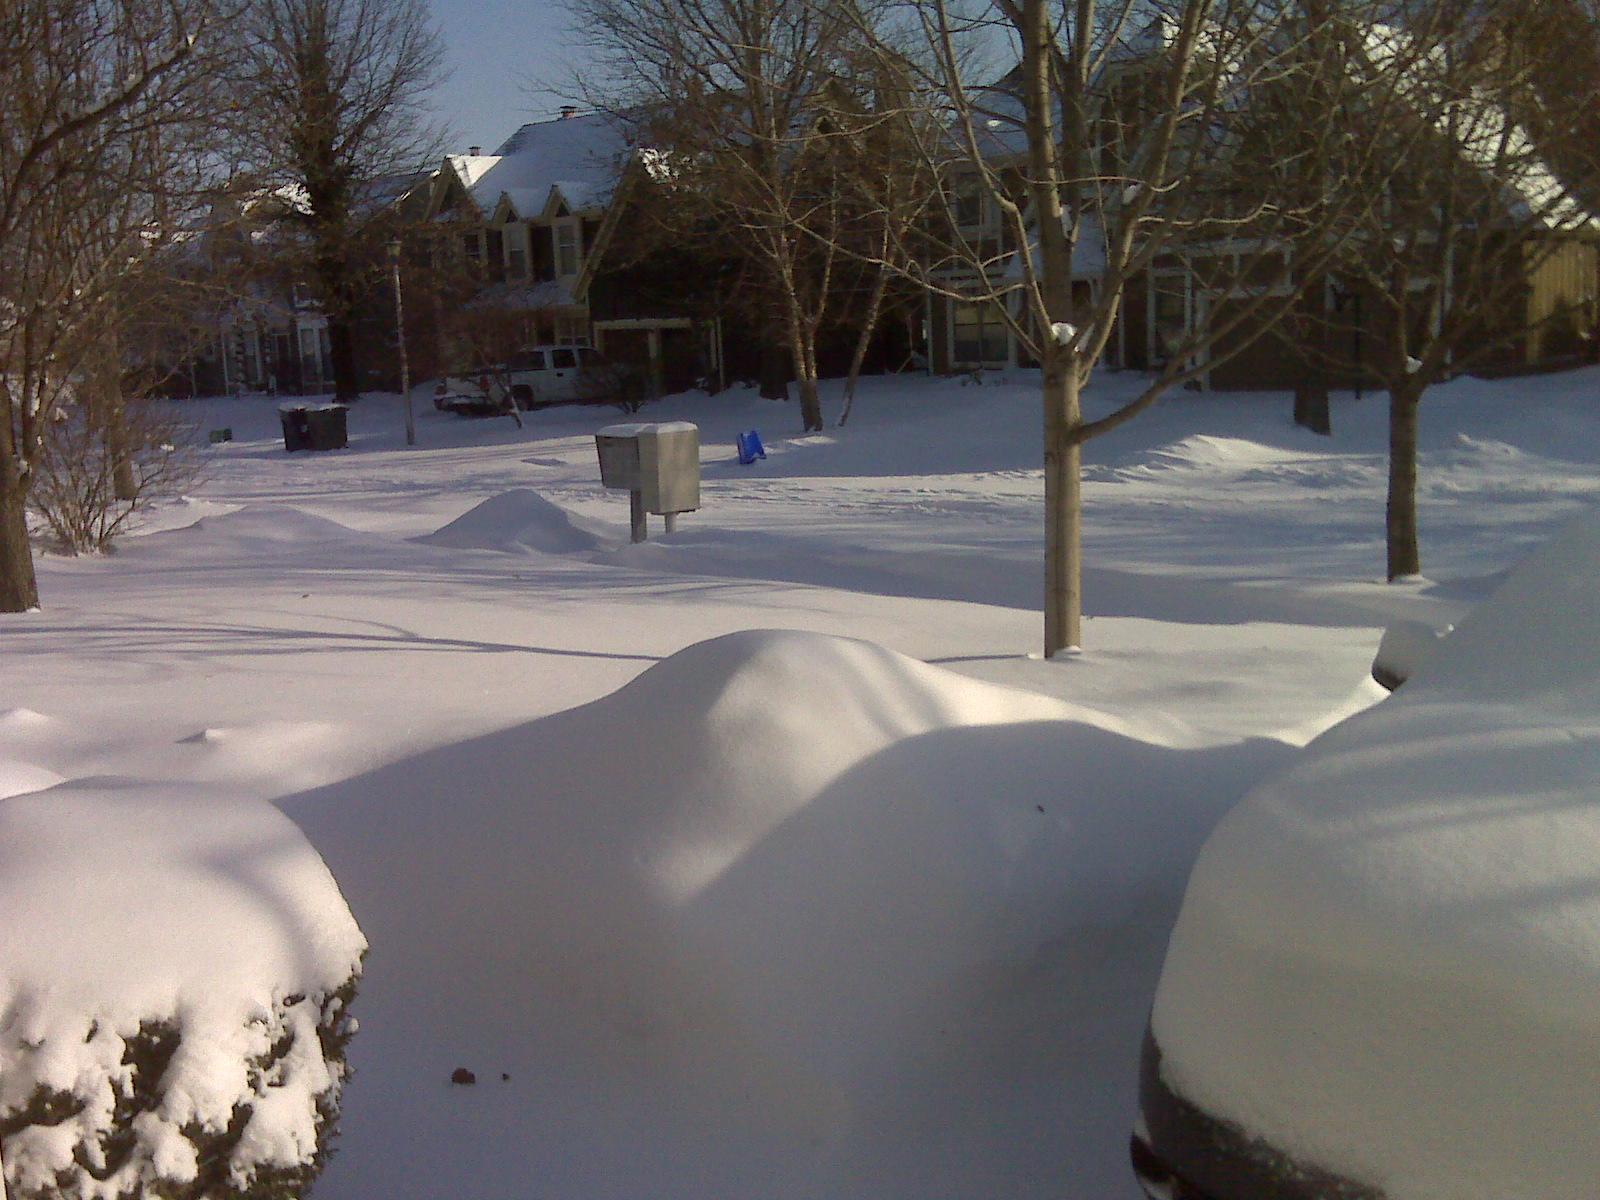 [snow]